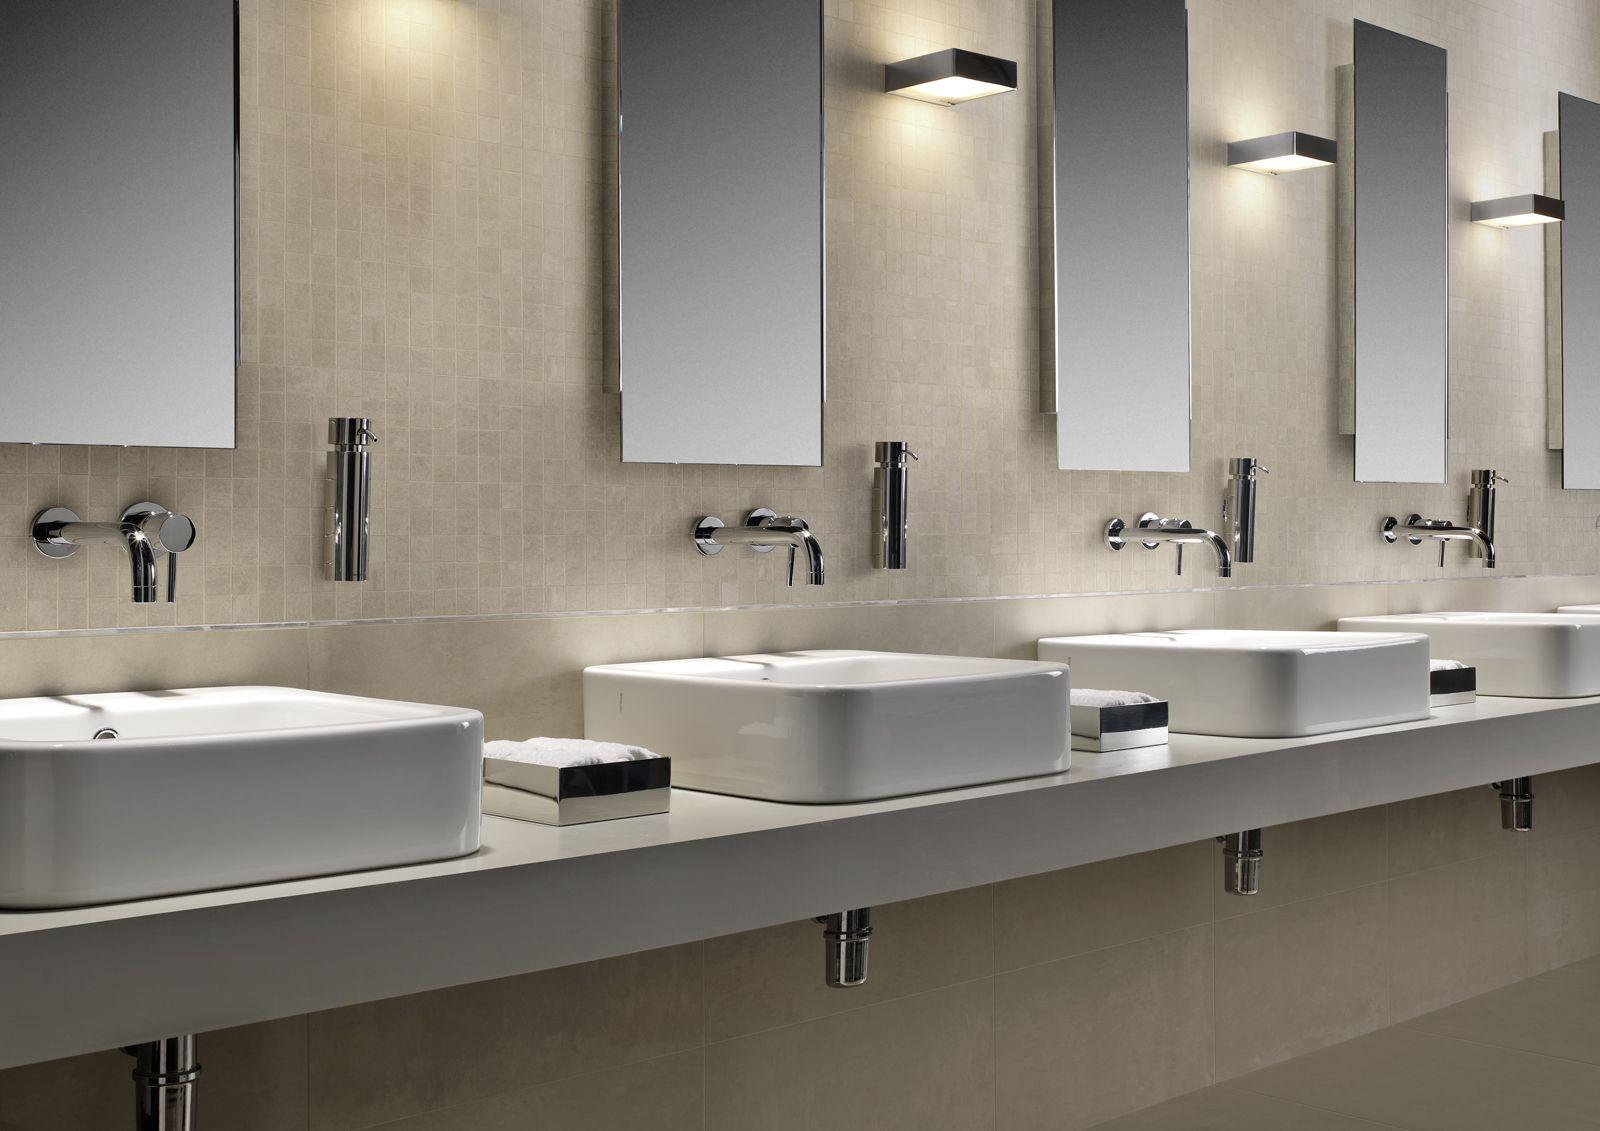 Stocco arredobagno ~ Stocco beige meuble bathroom salledebain bois vasques sdb